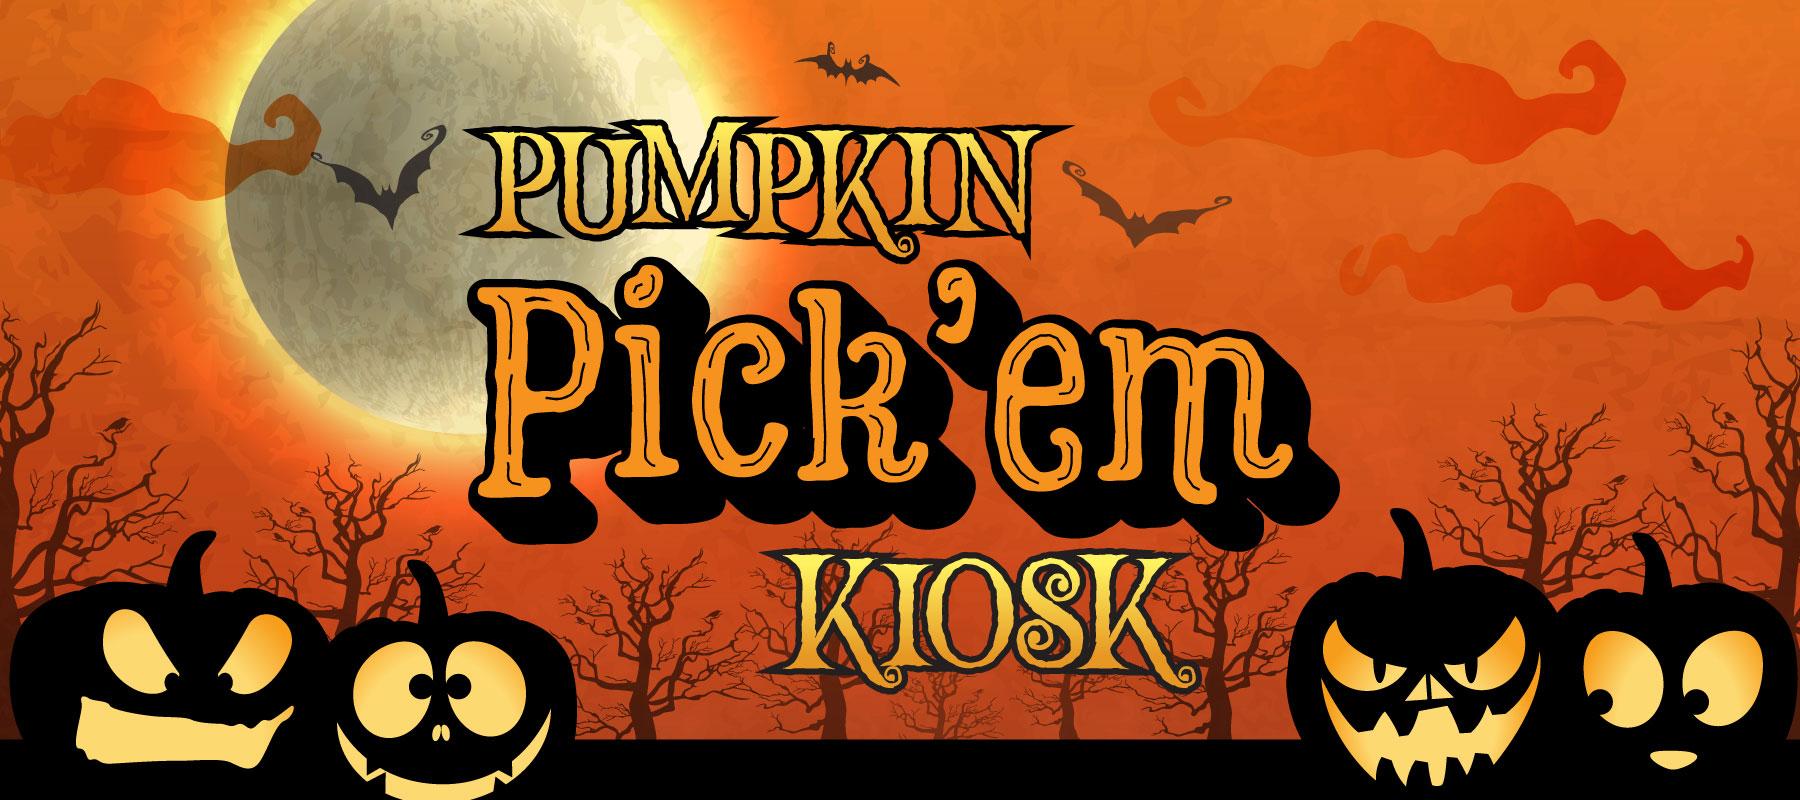 Pumpkin Pick 'Em Kiosk